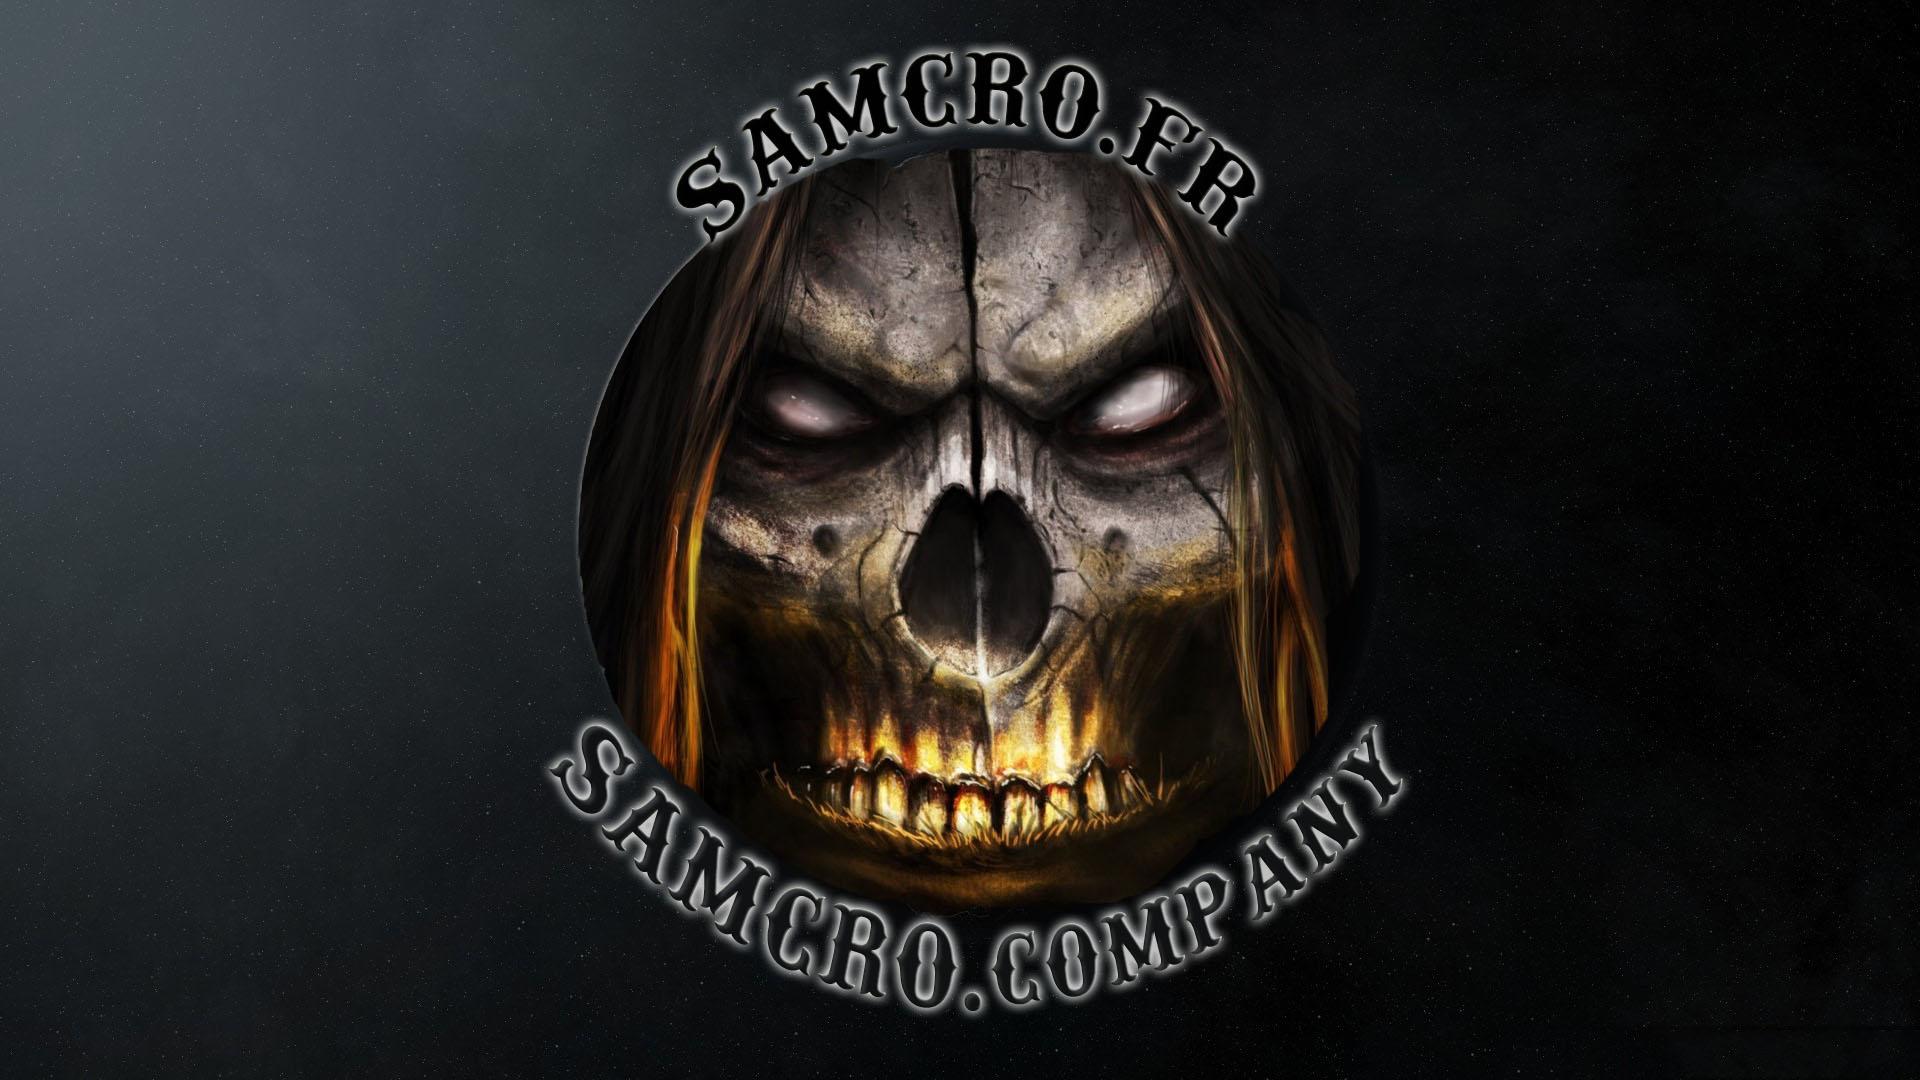 samcro.fr Samcro.Fr www.samcro.fr SAMCRO.FR